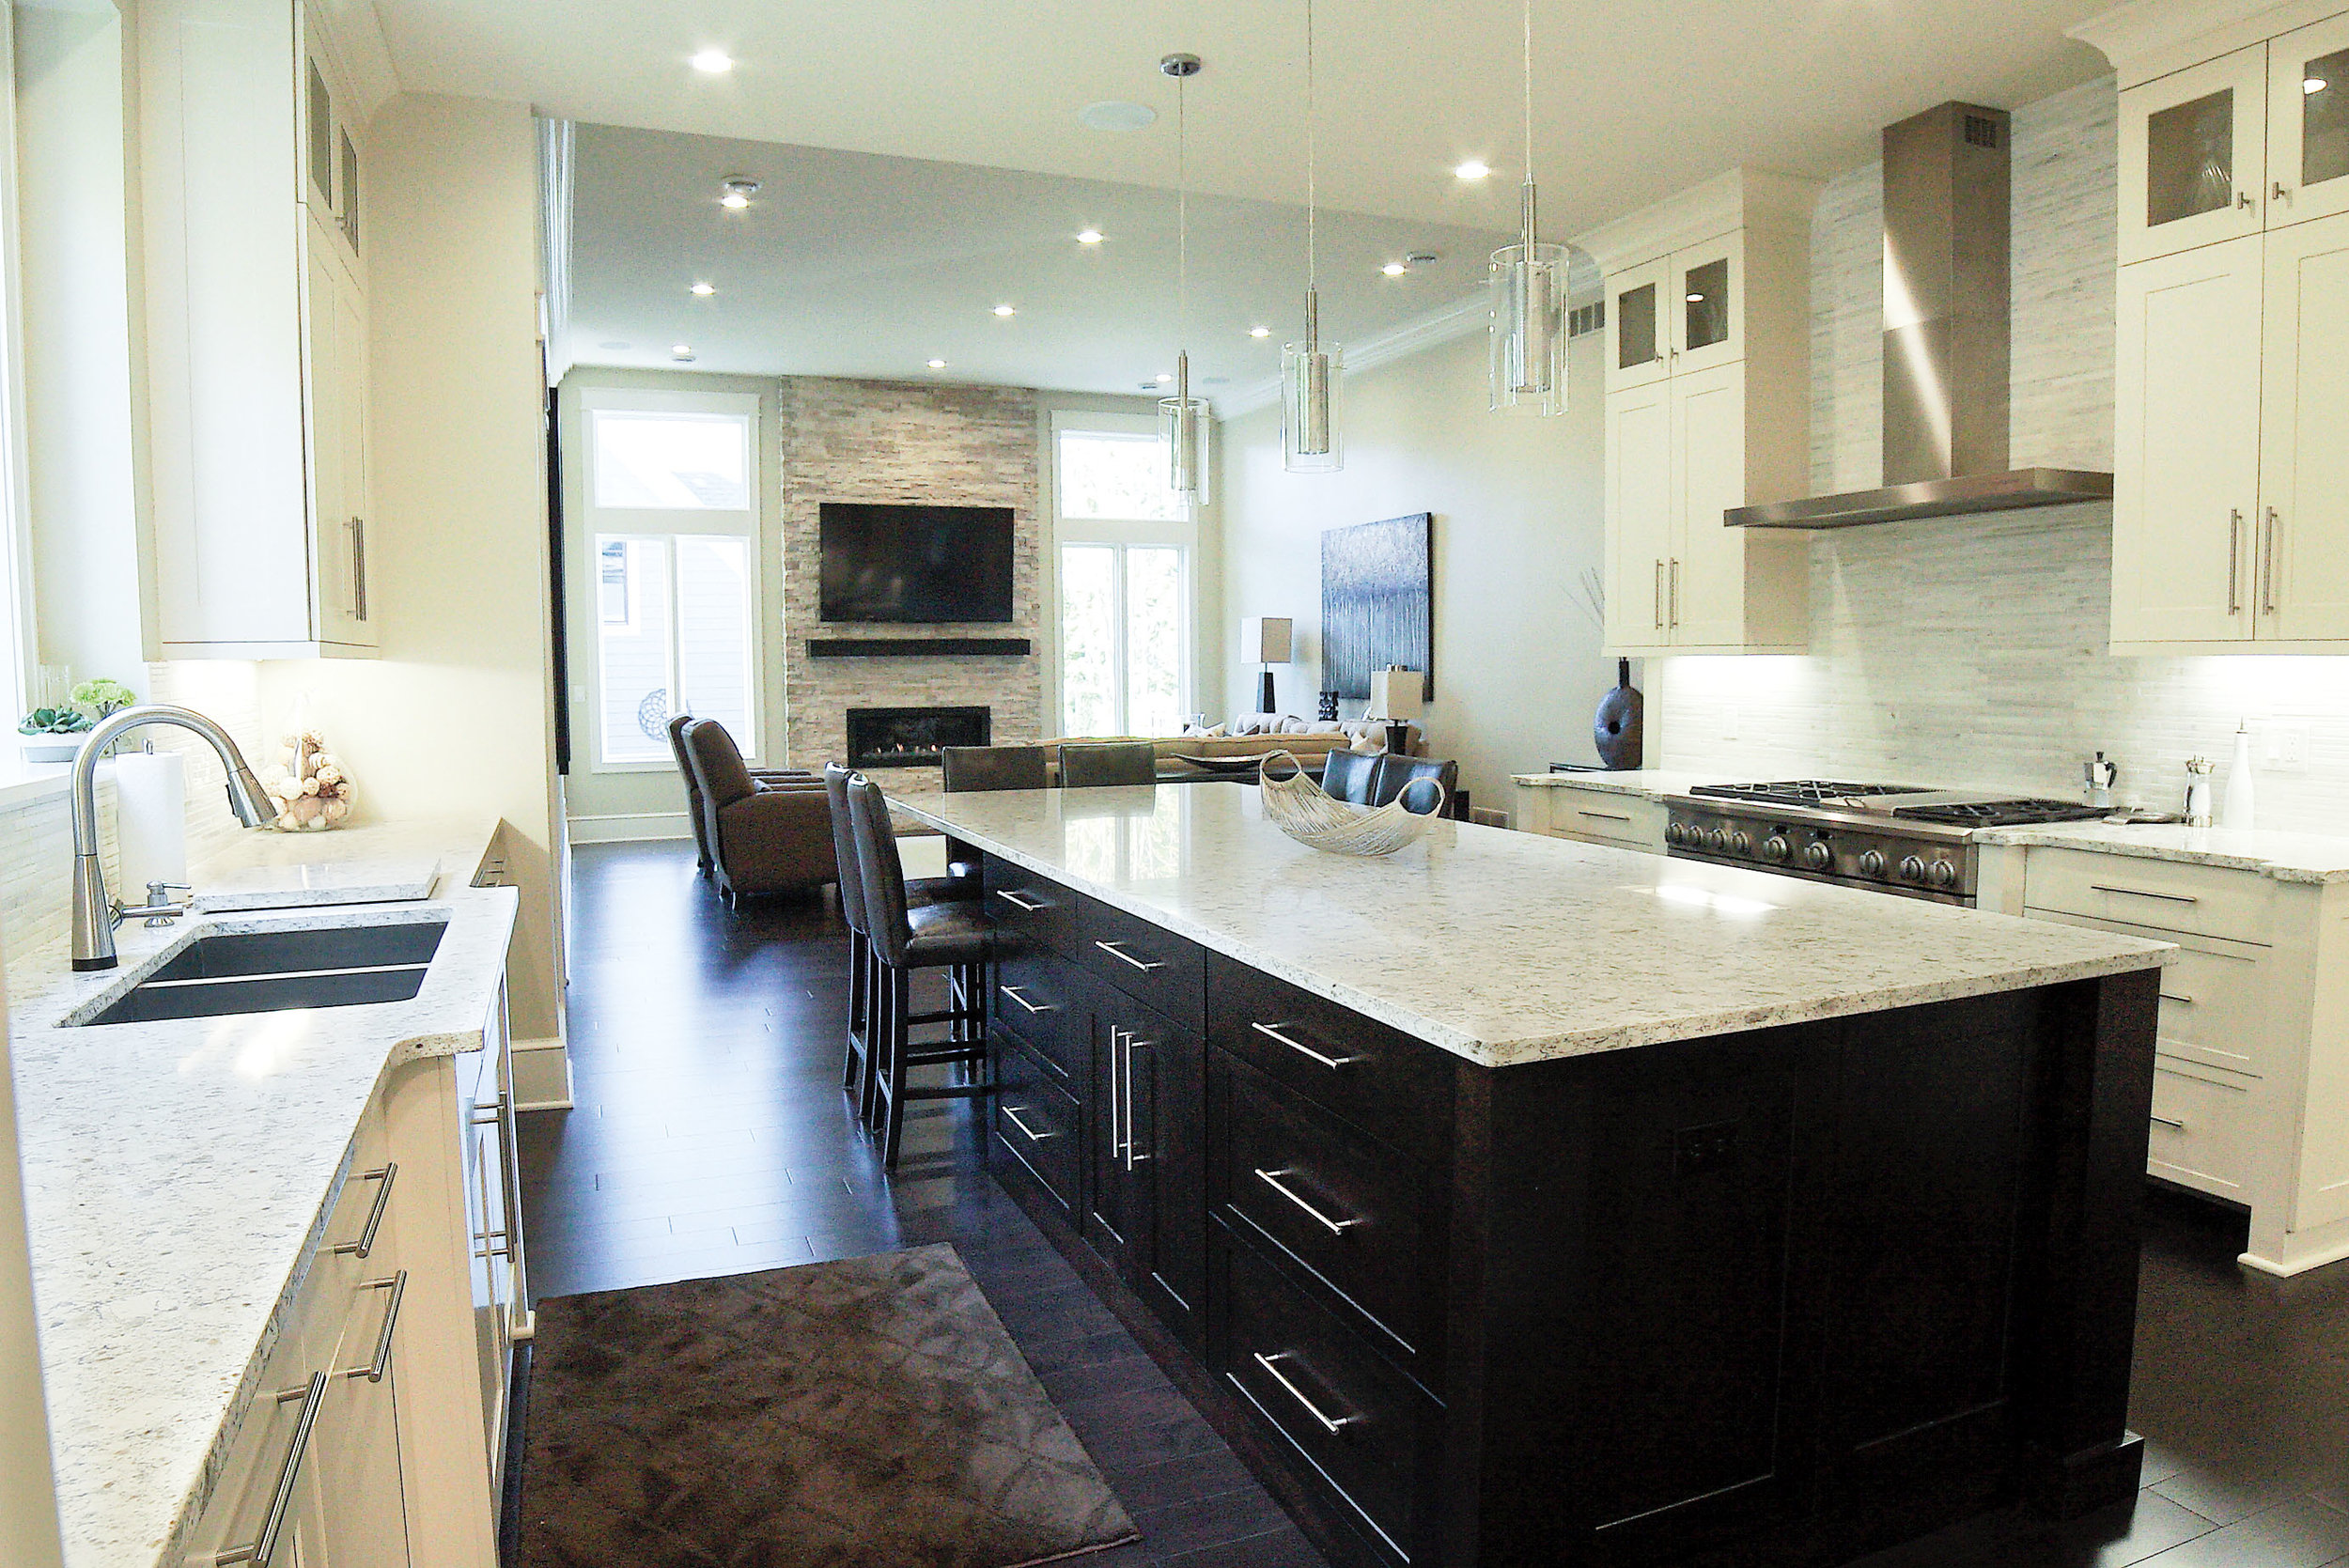 Kitchen_Island_Full_DSC05578.jpg